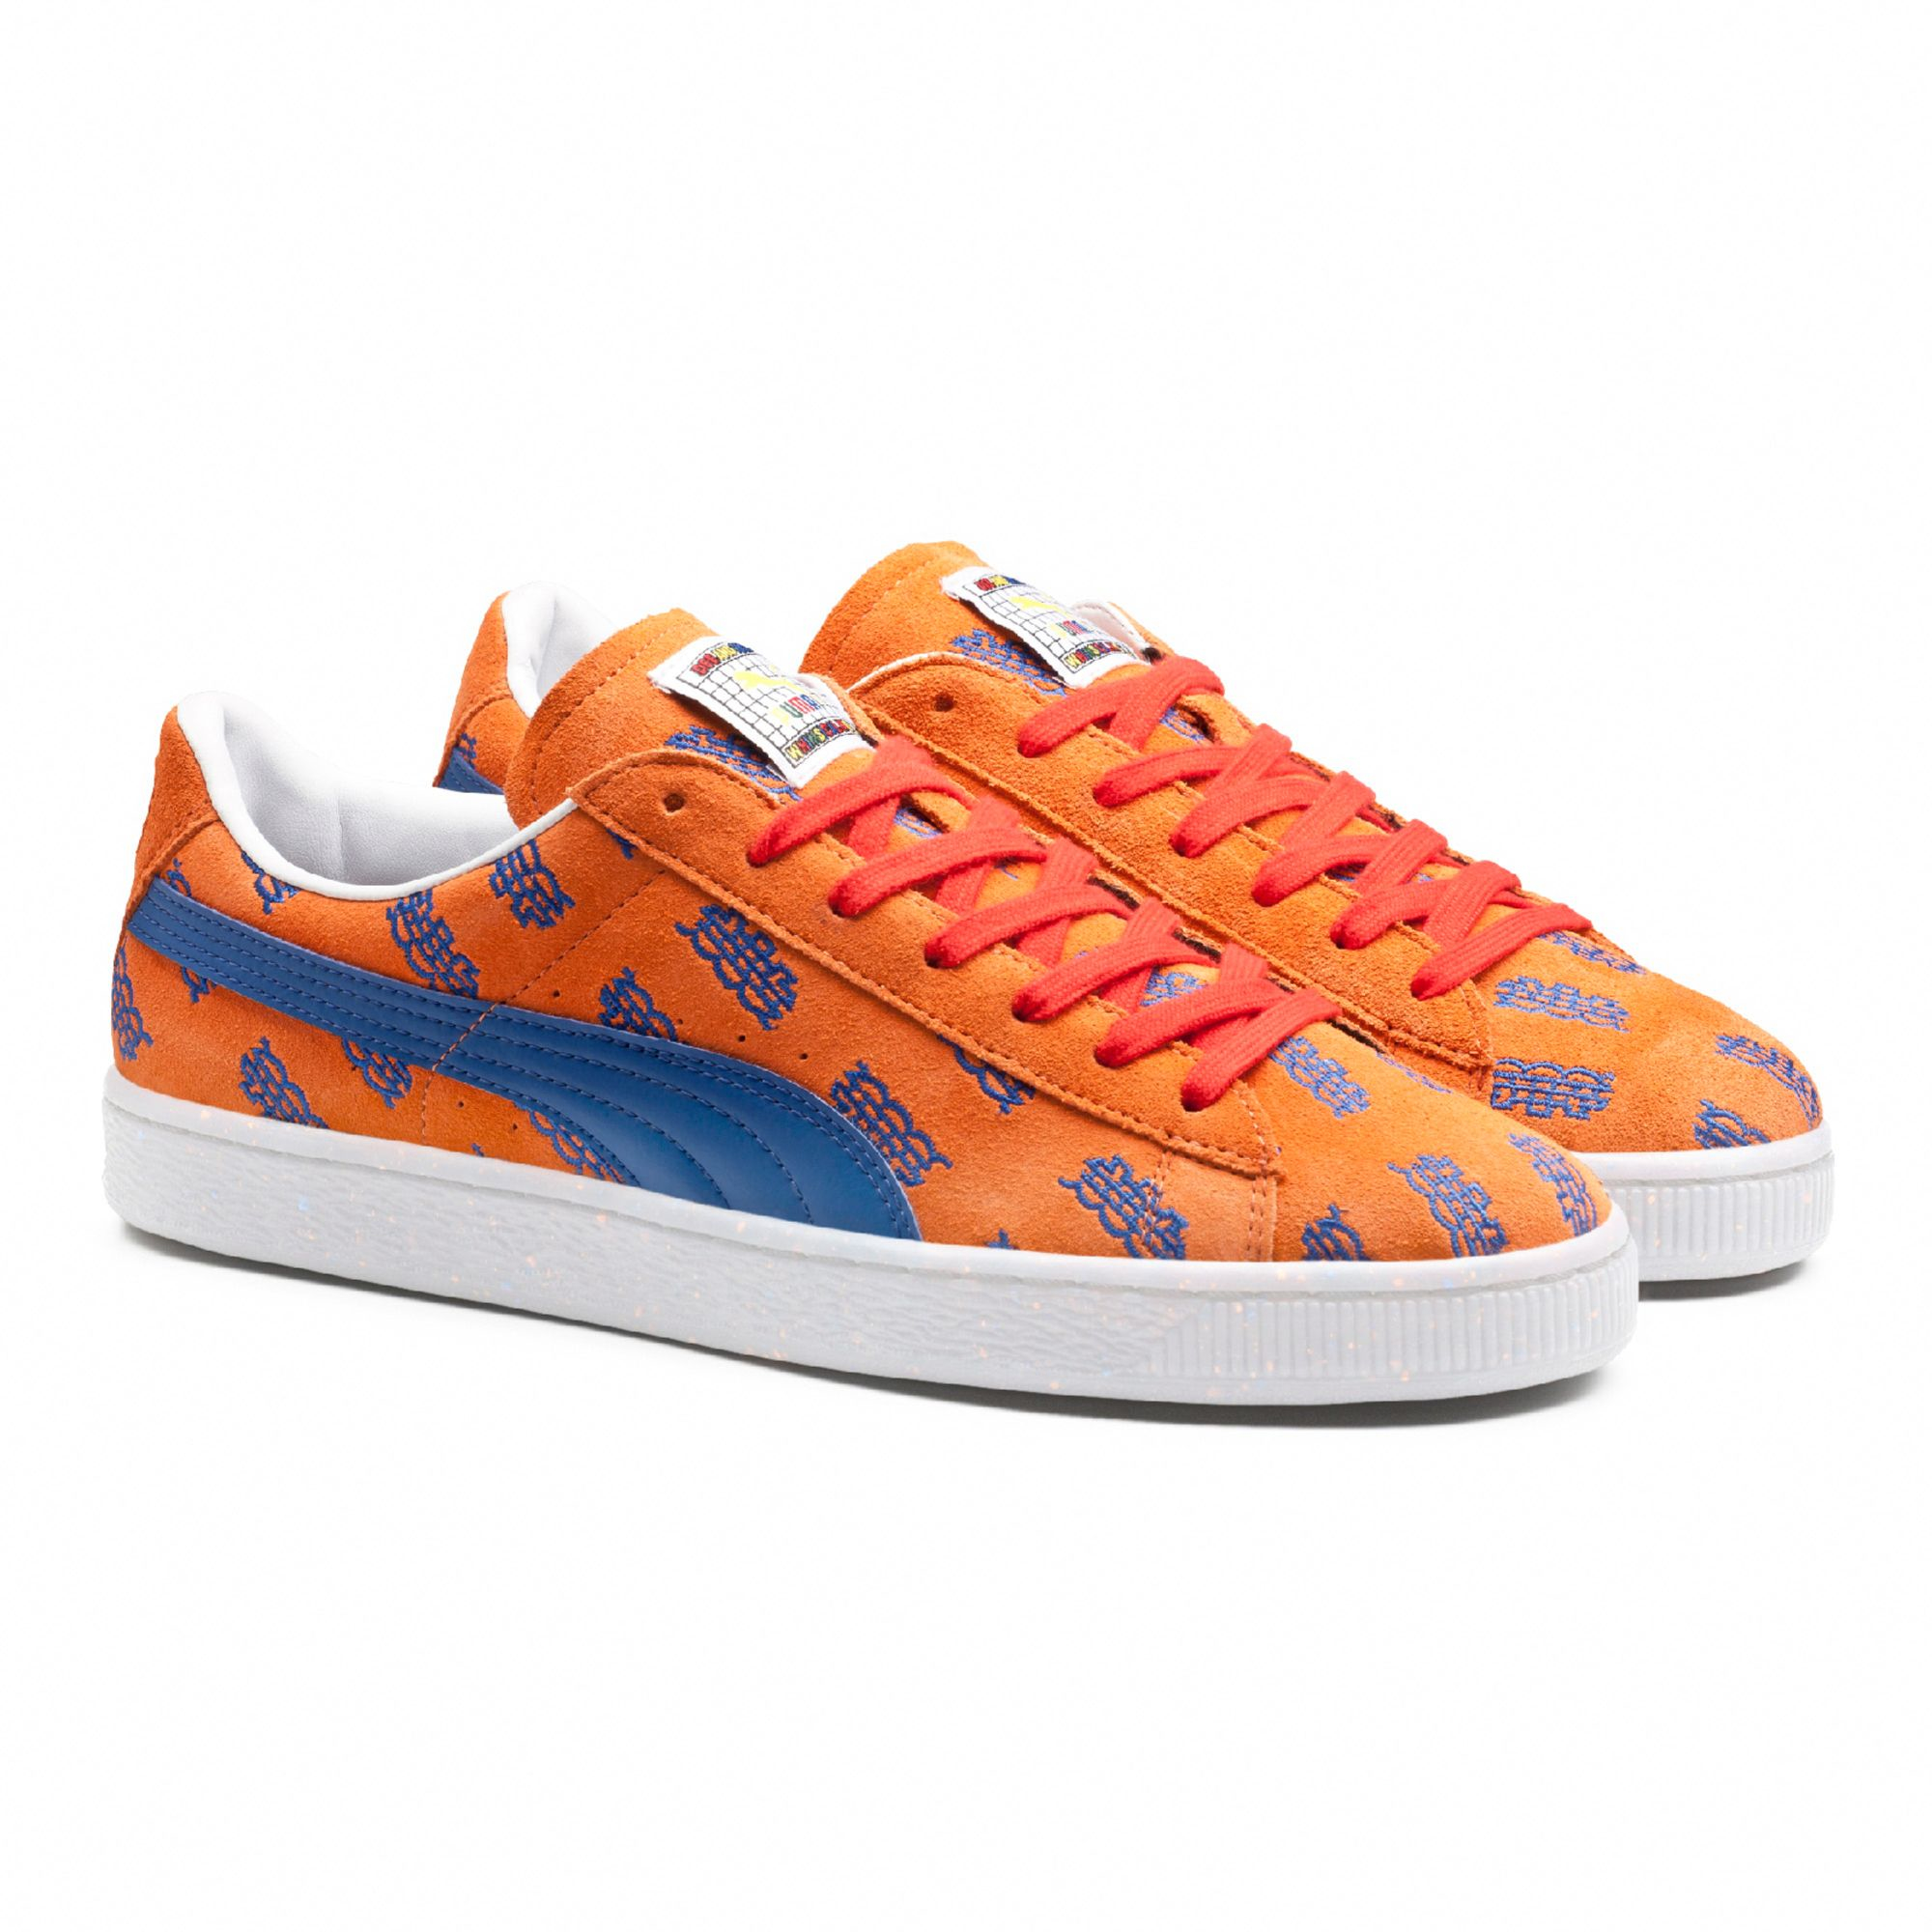 d0cab4540e4 Lyst - PUMA X Dee   Ricky Basket Nyc in Orange